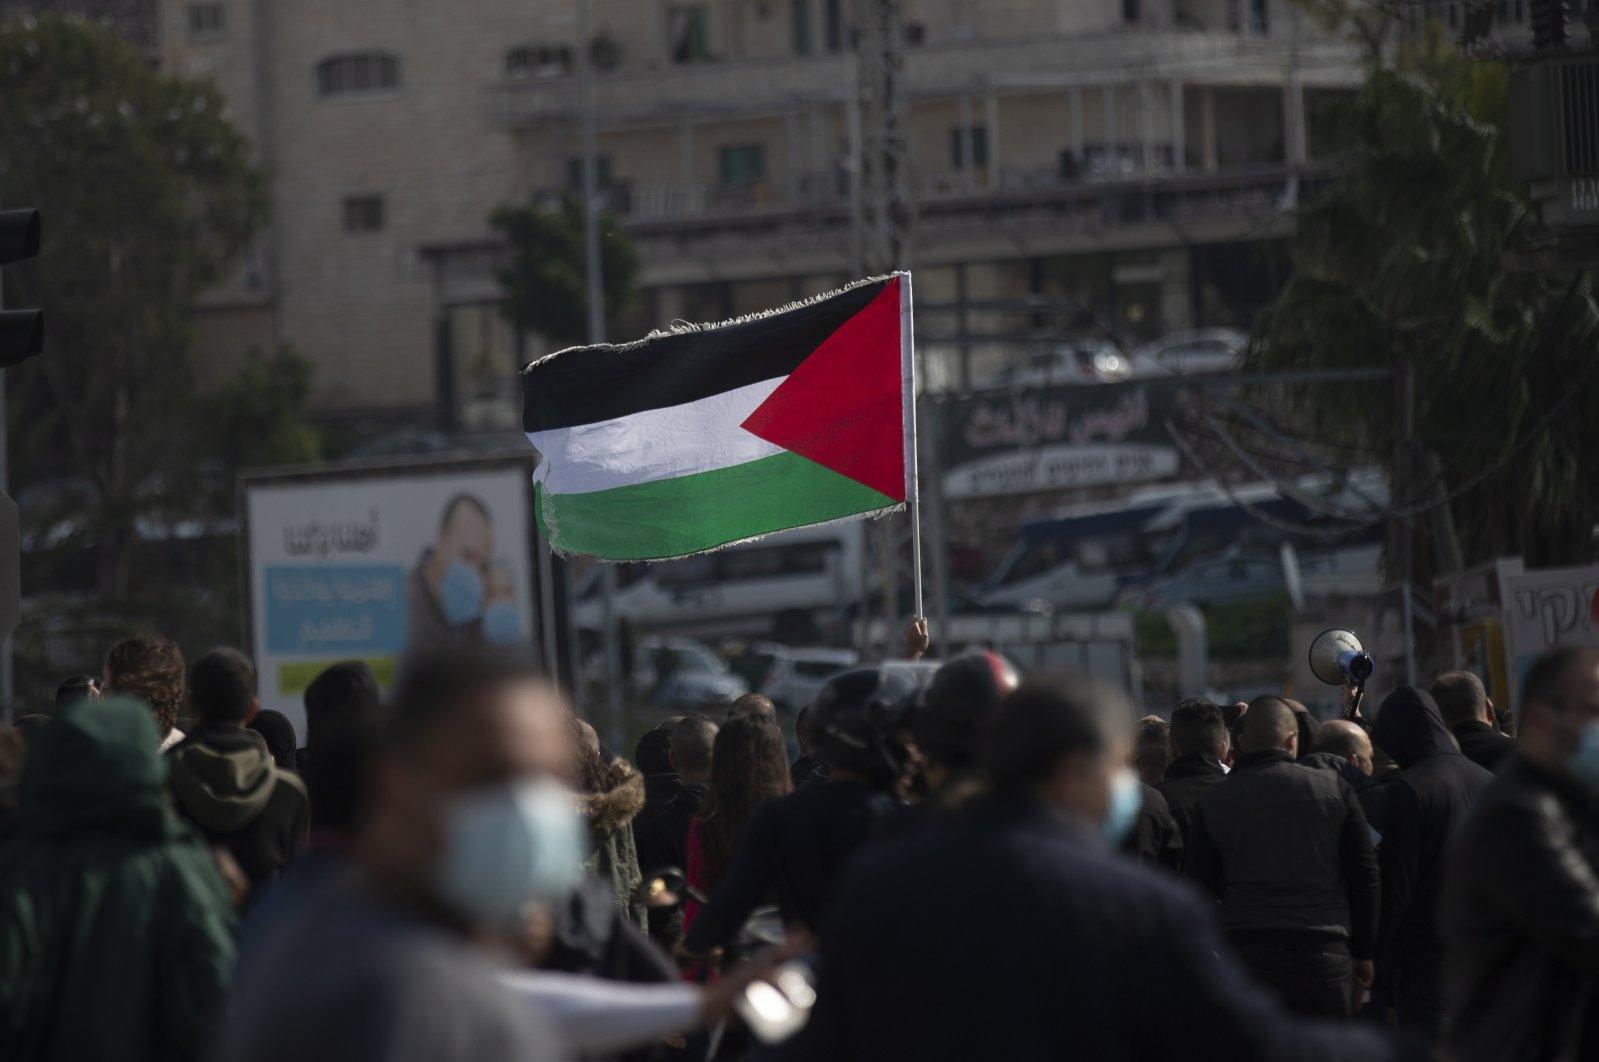 Israeli Arabs protest in Umm al-Fahm, northwest of Jenin, Haifa District, Israel, Feb. 5, 2021. (EPA File Photo)